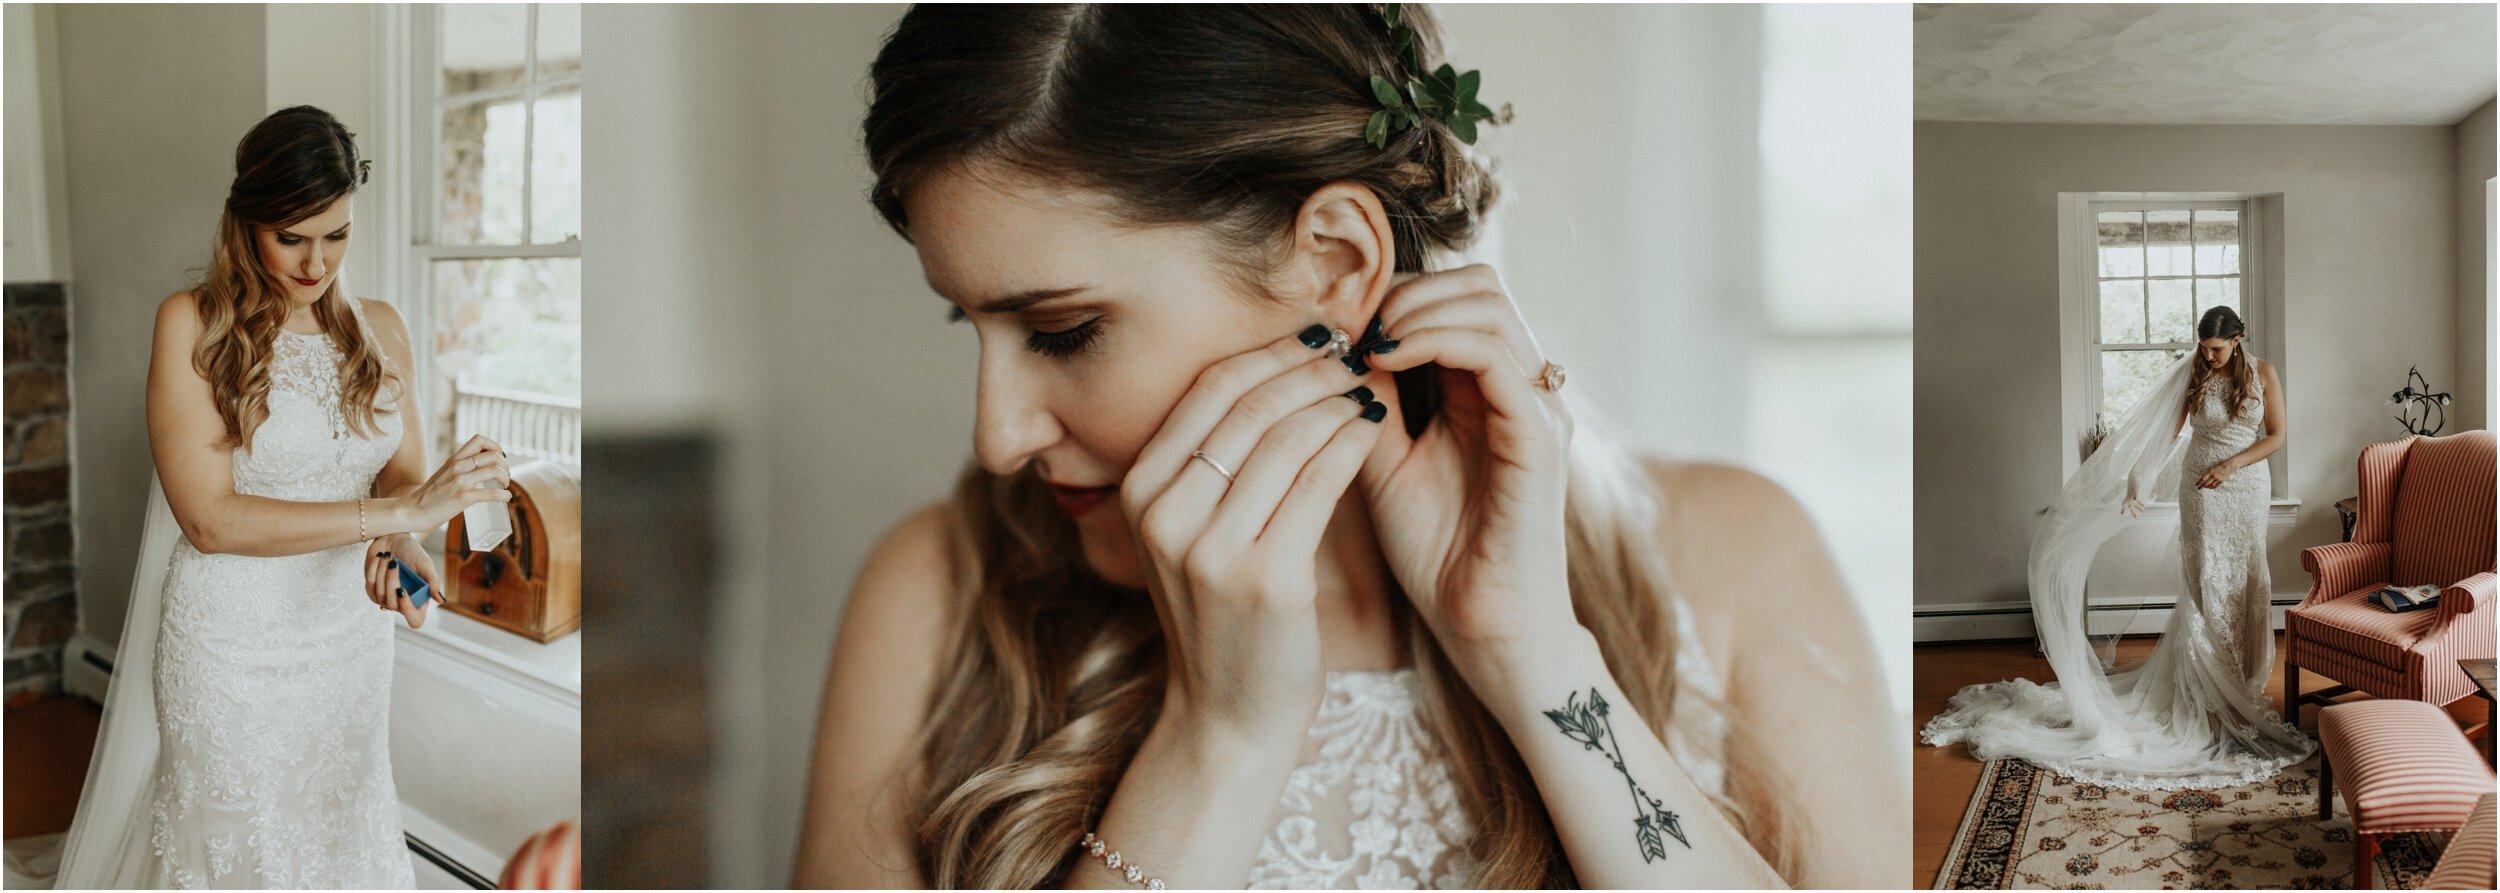 steph-and-jordan-cox-our-wedding-historic-shady-lane-compass-wedding-collective-hazel-lining-photography-destination-elopement-wedding-engagement-photography_0015.jpg